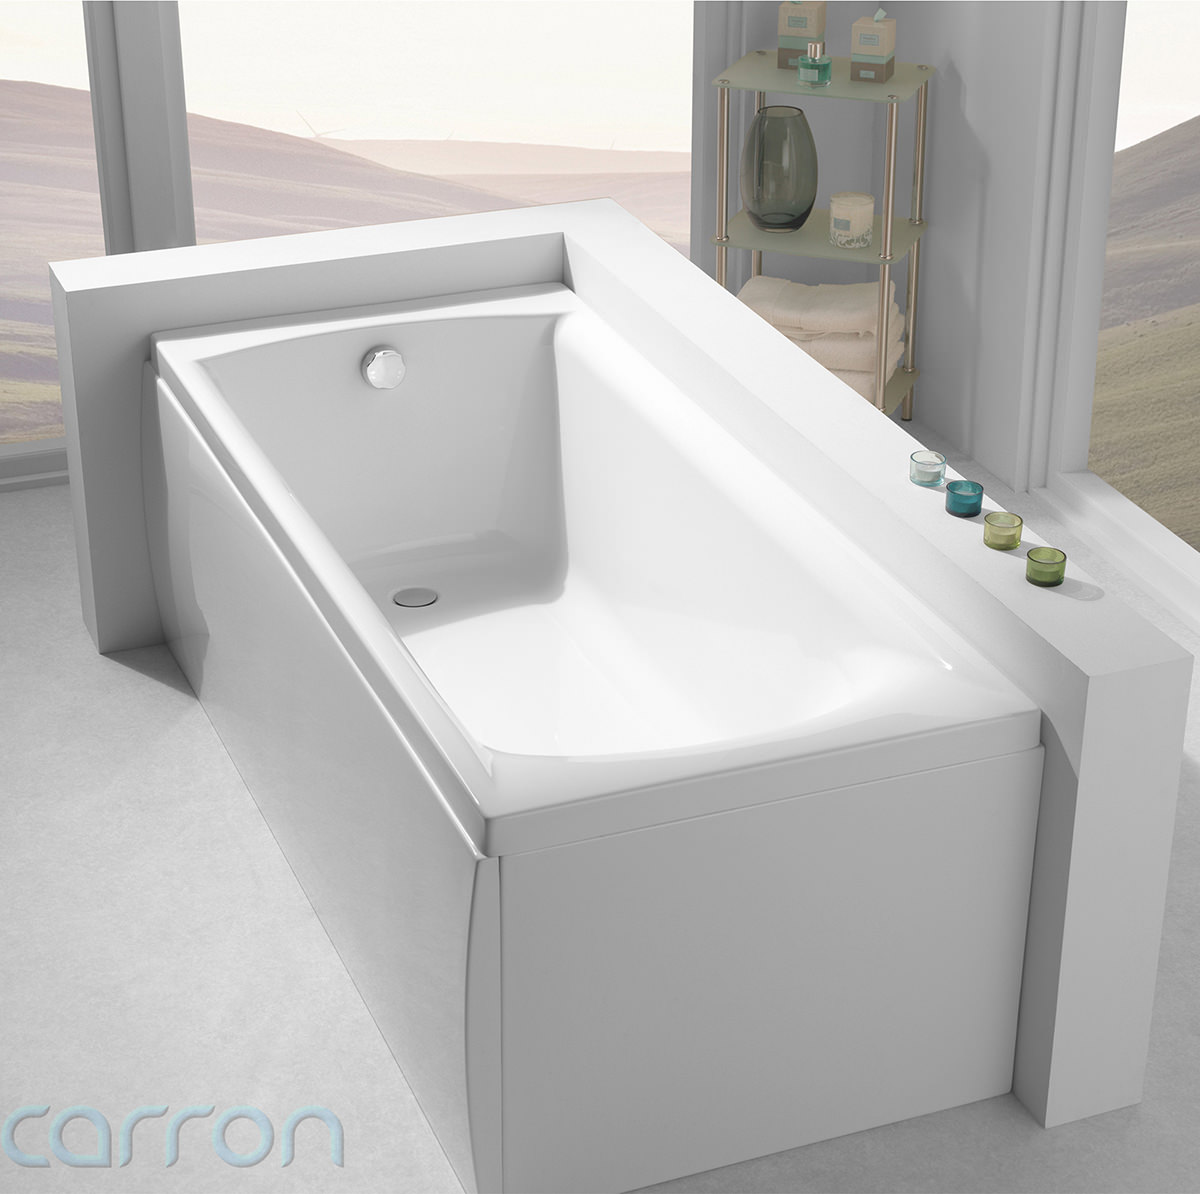 Carron Delta Acrylic Bath 1400 X 700mm Cabde145pa Q4 02047